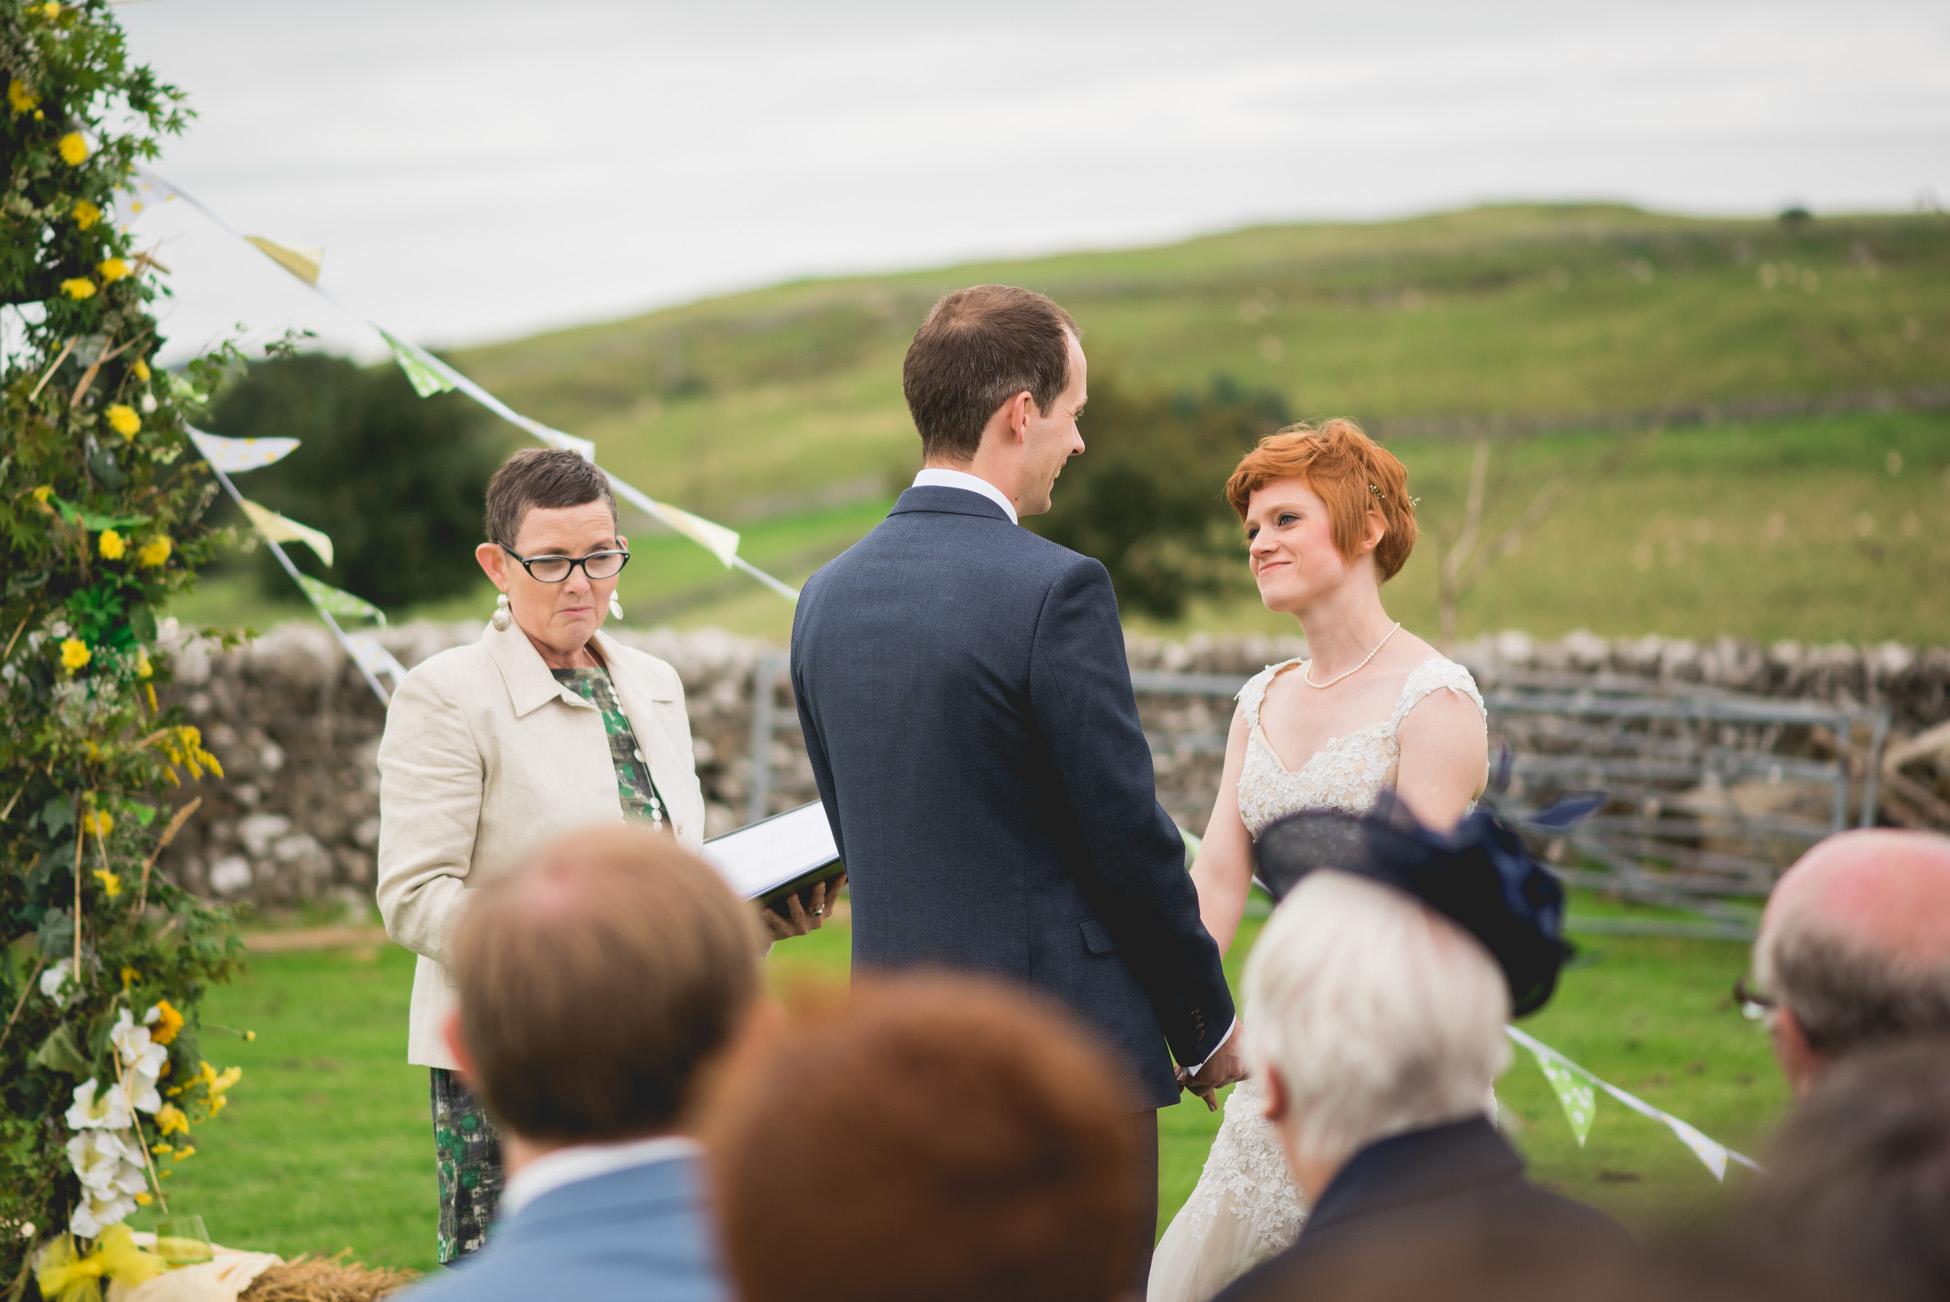 Peak+district+farm+wedding+lower+damgate+photographer-131.jpg